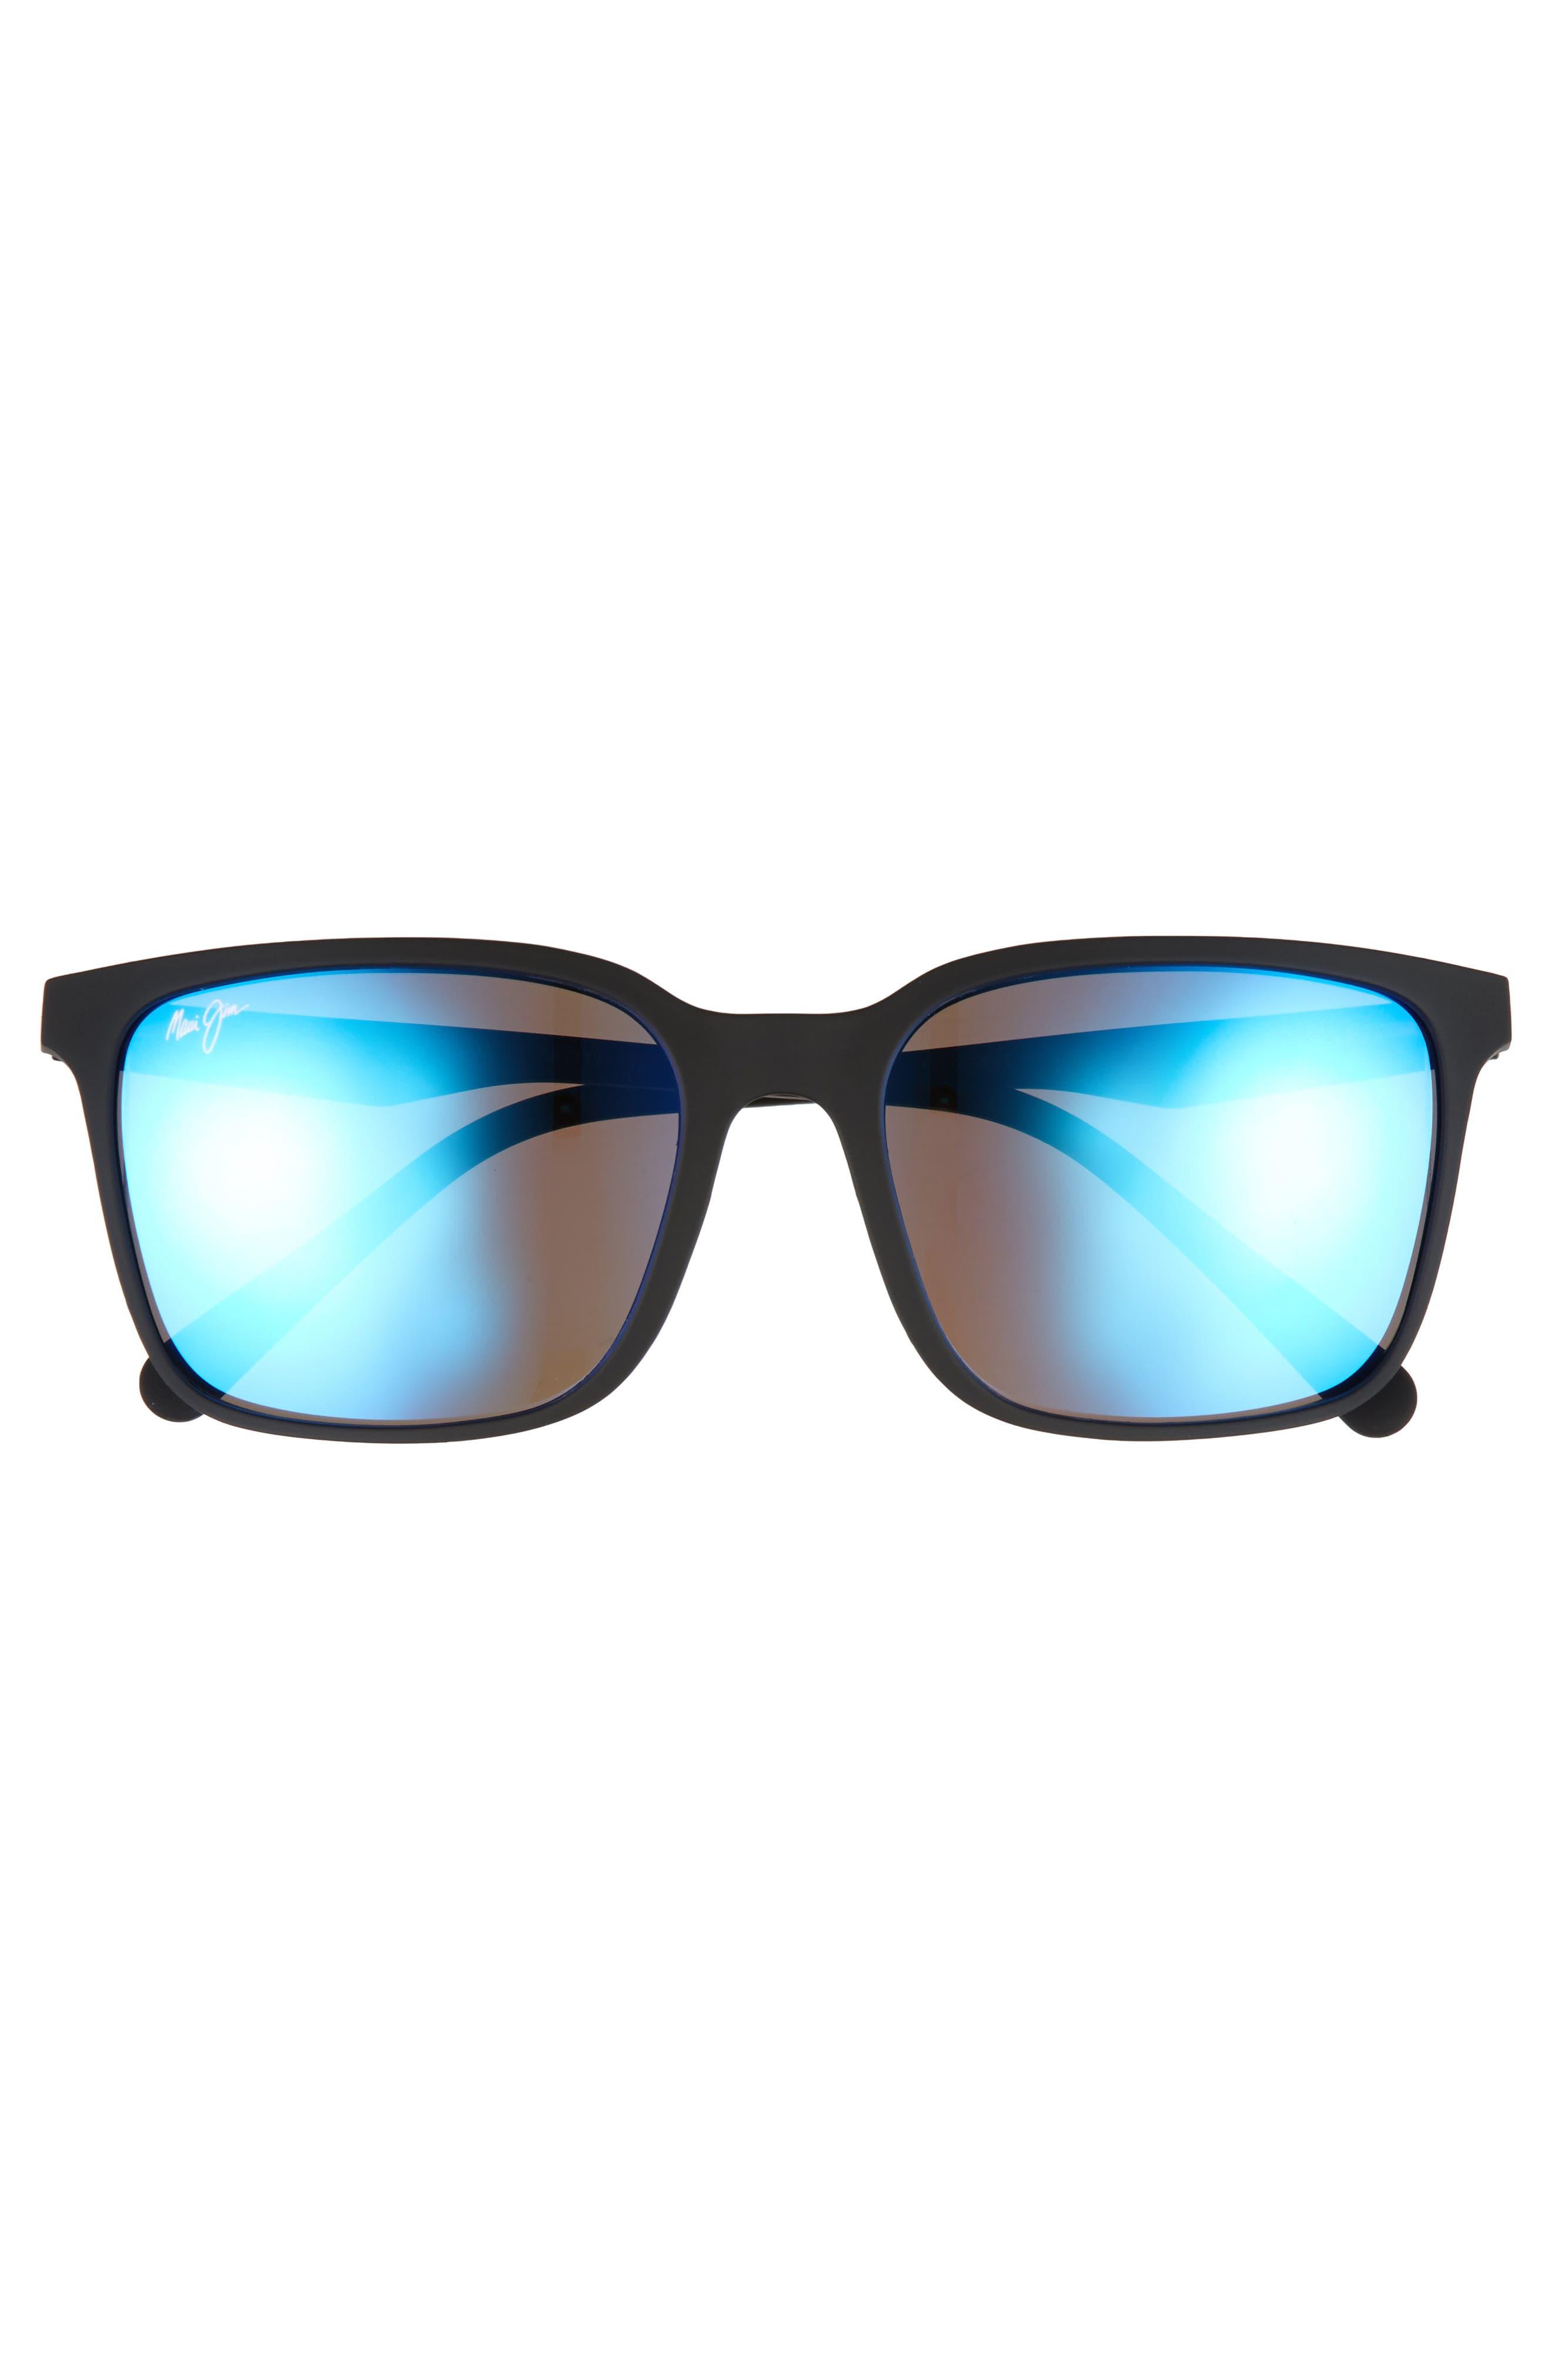 Wild Coast 56mm Polarized Sunglasses,                             Alternate thumbnail 2, color,                             Matte Black/ Blue Hawaii